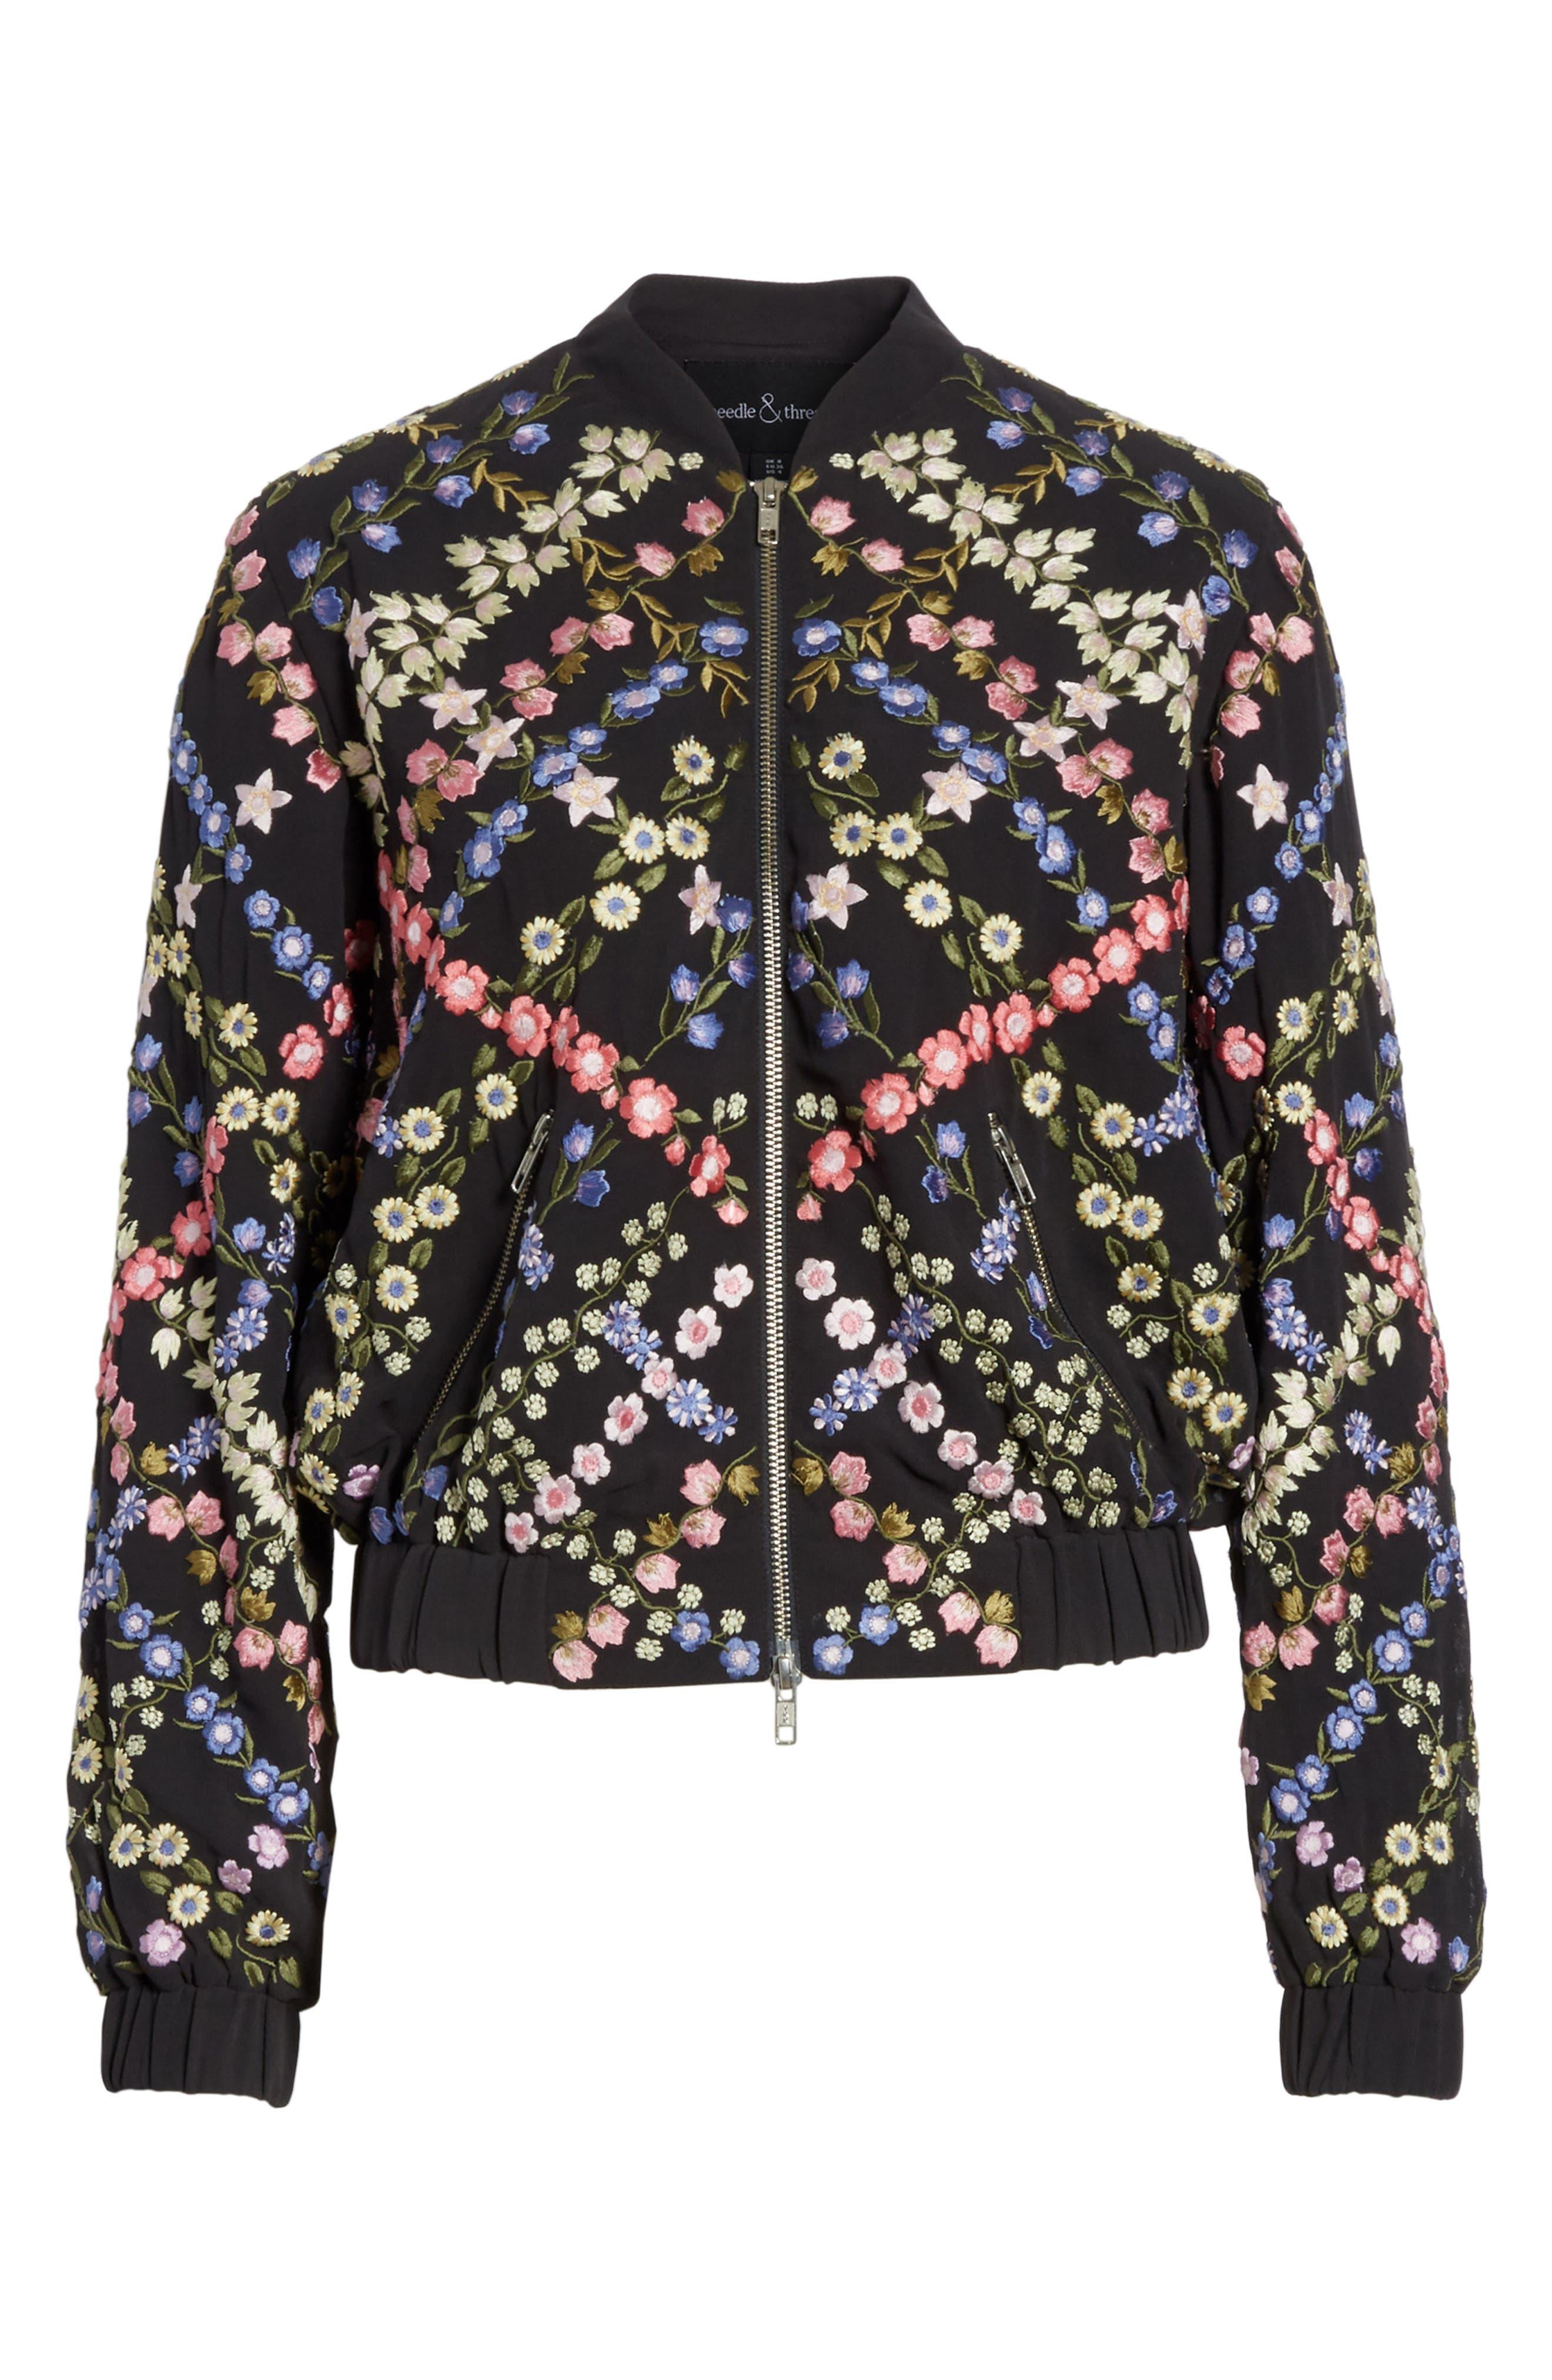 Crosshatch Embroidered Bomber Jacket,                             Alternate thumbnail 6, color,                             Graphite / Lavender